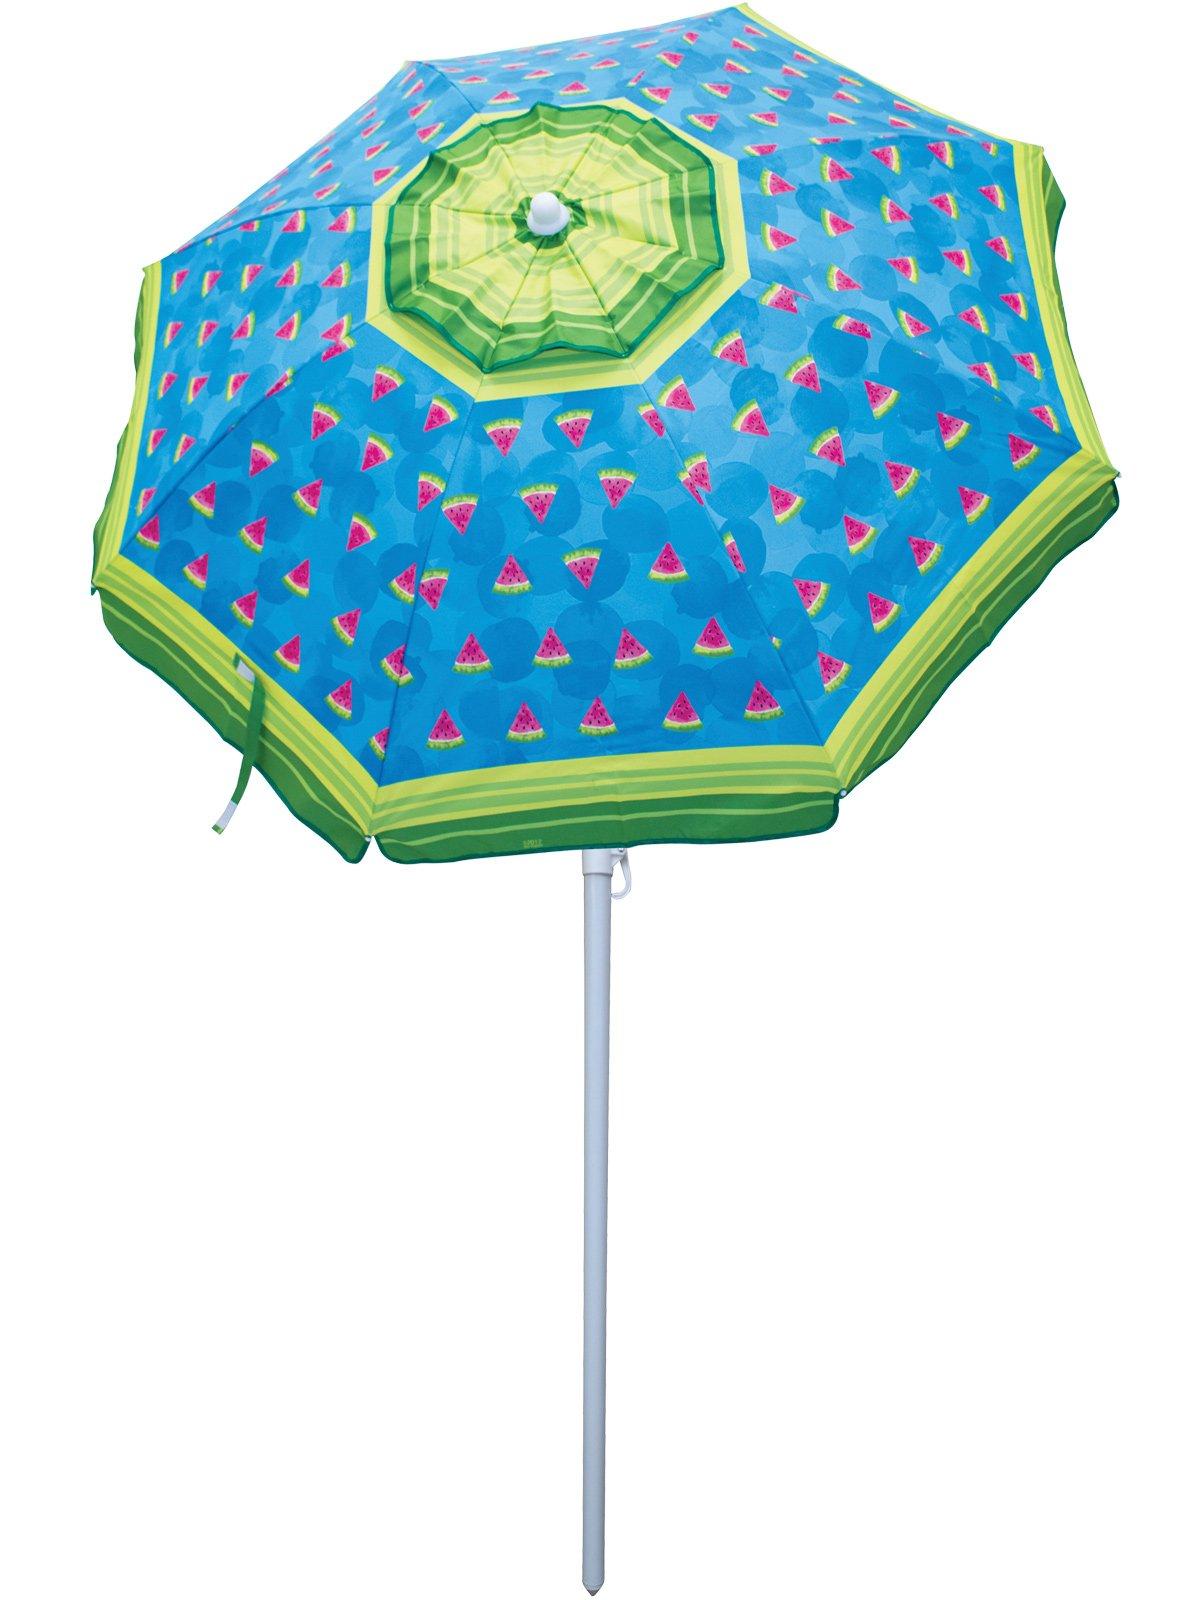 Rio Beach 6' Beach Umbrella with Sun Block, Watermelon